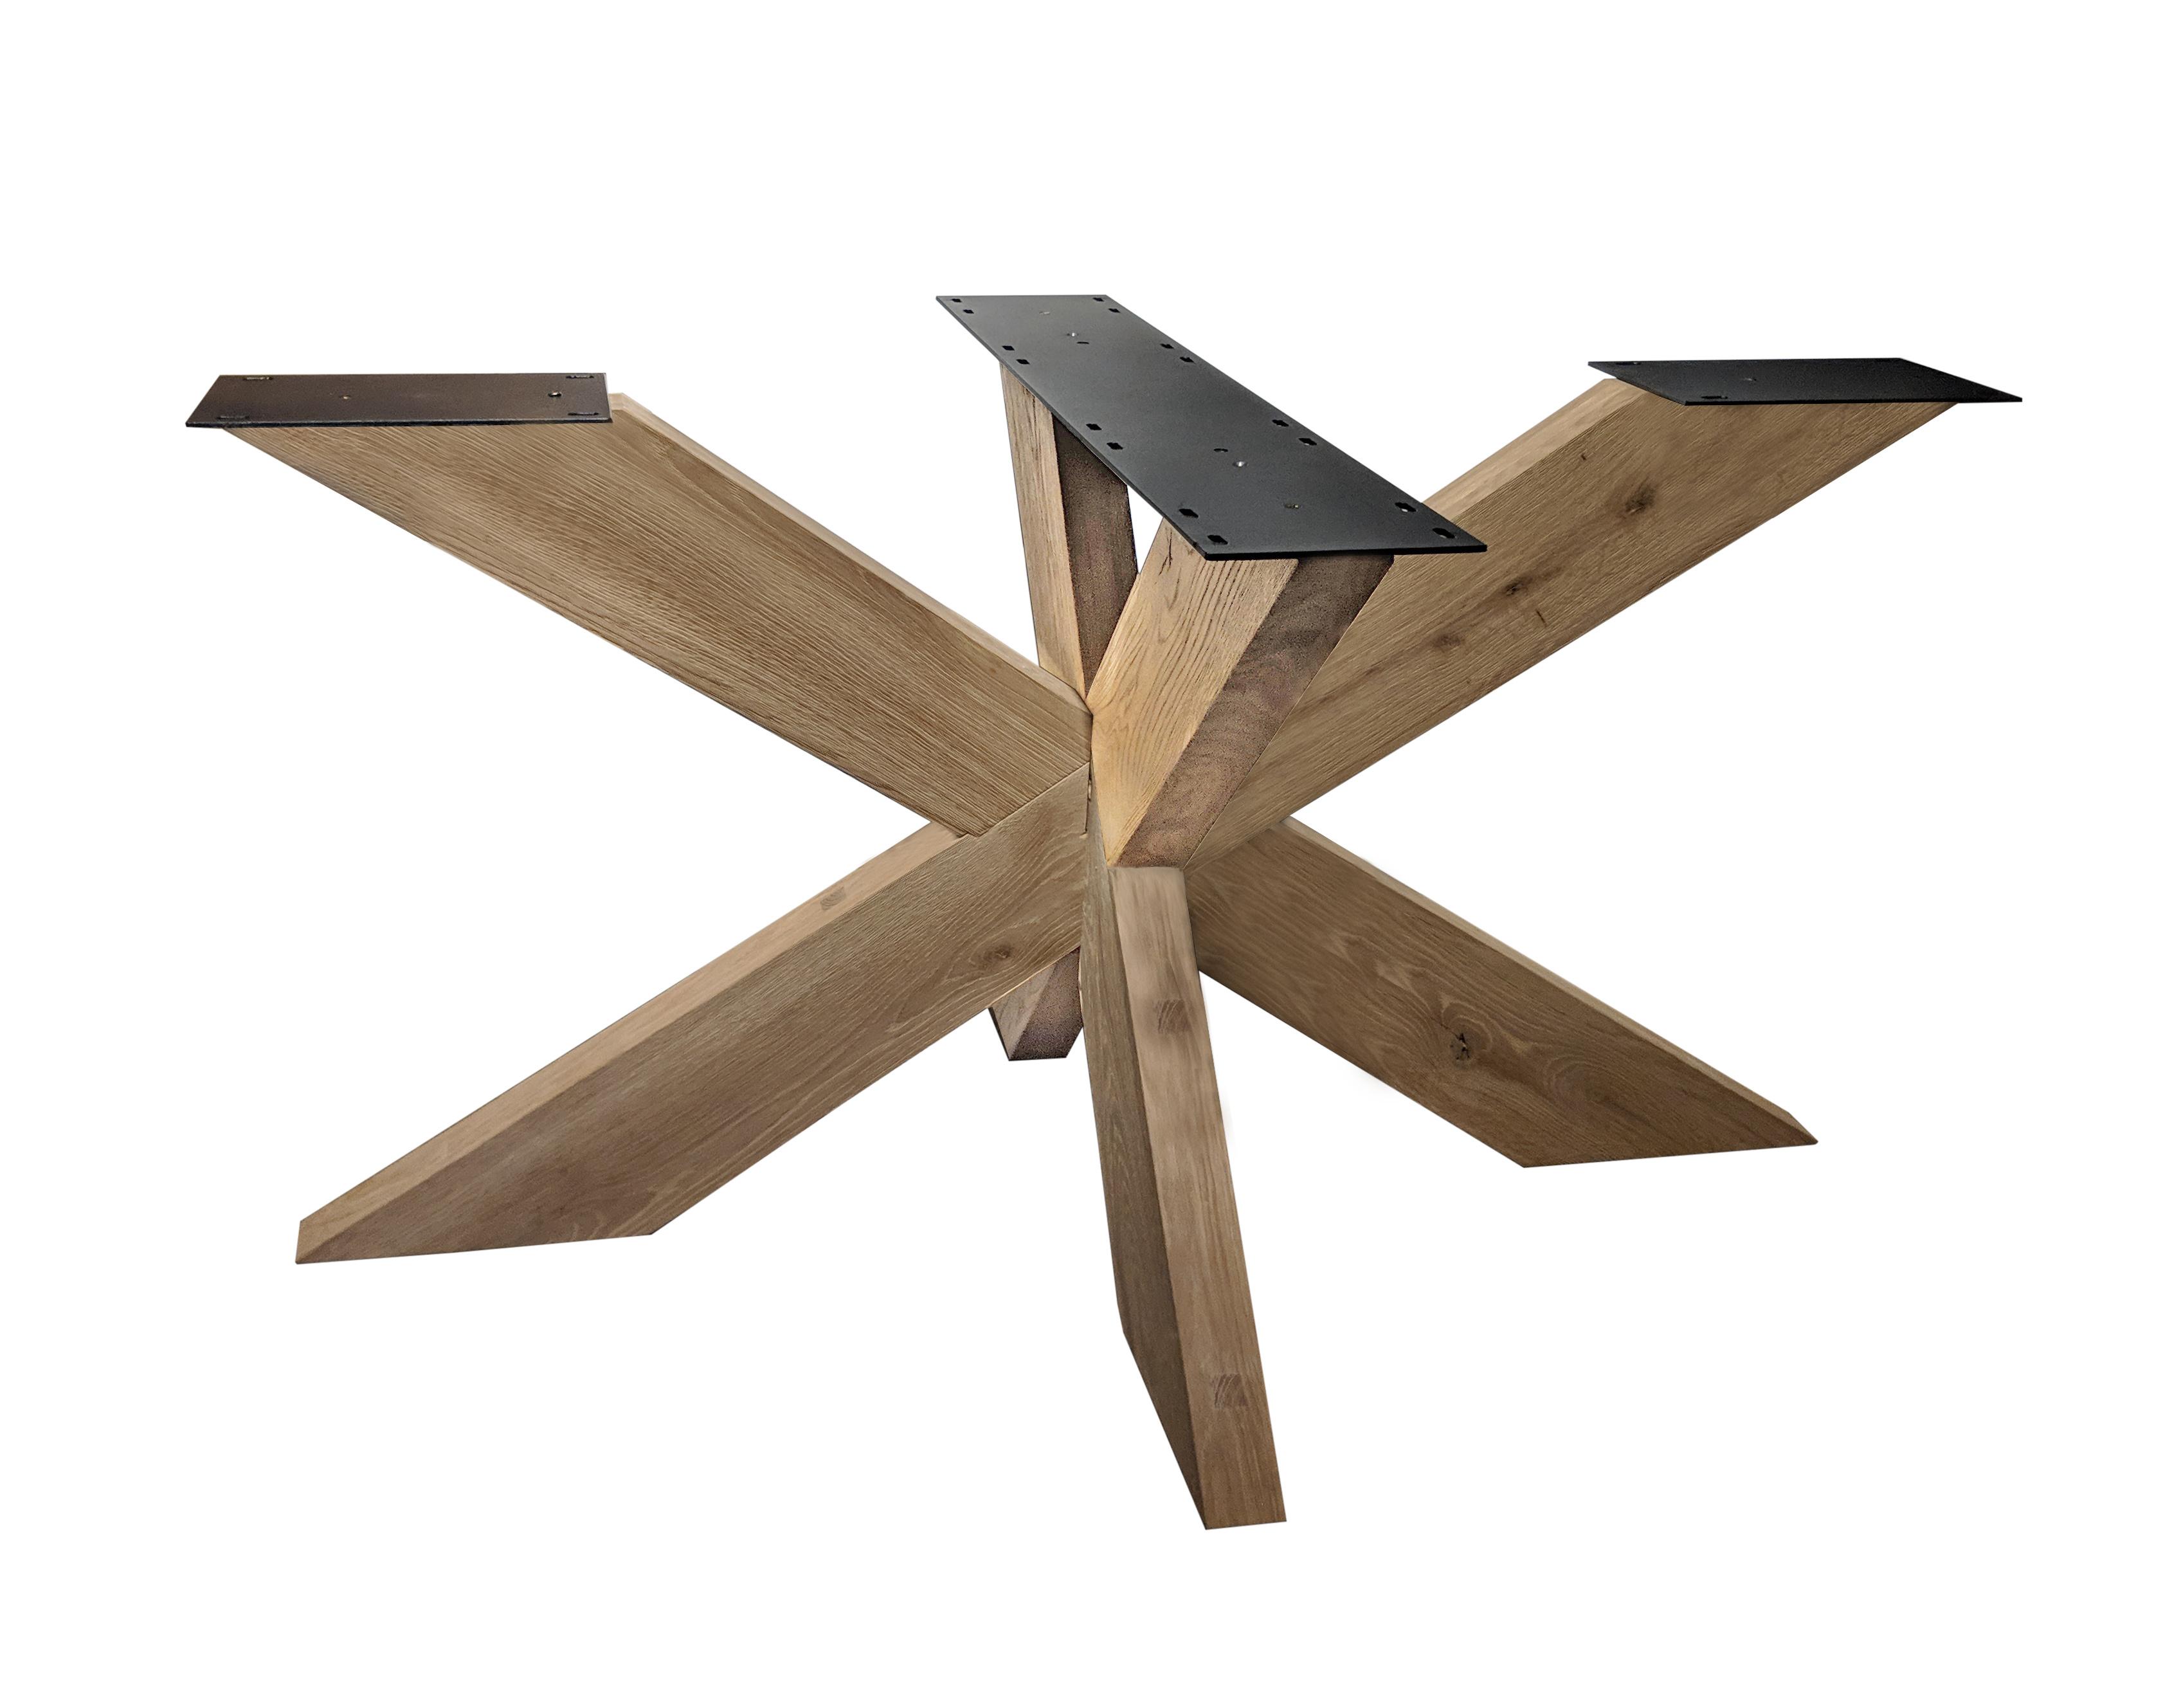 Eiken matrix 3D tafelpoot 16x6 cm - 72 cm hoog - 180x90 cm  - Rustiek licht geborsteld - Spin 3D kruis / X-poot - 12% kd Europees eikenhout